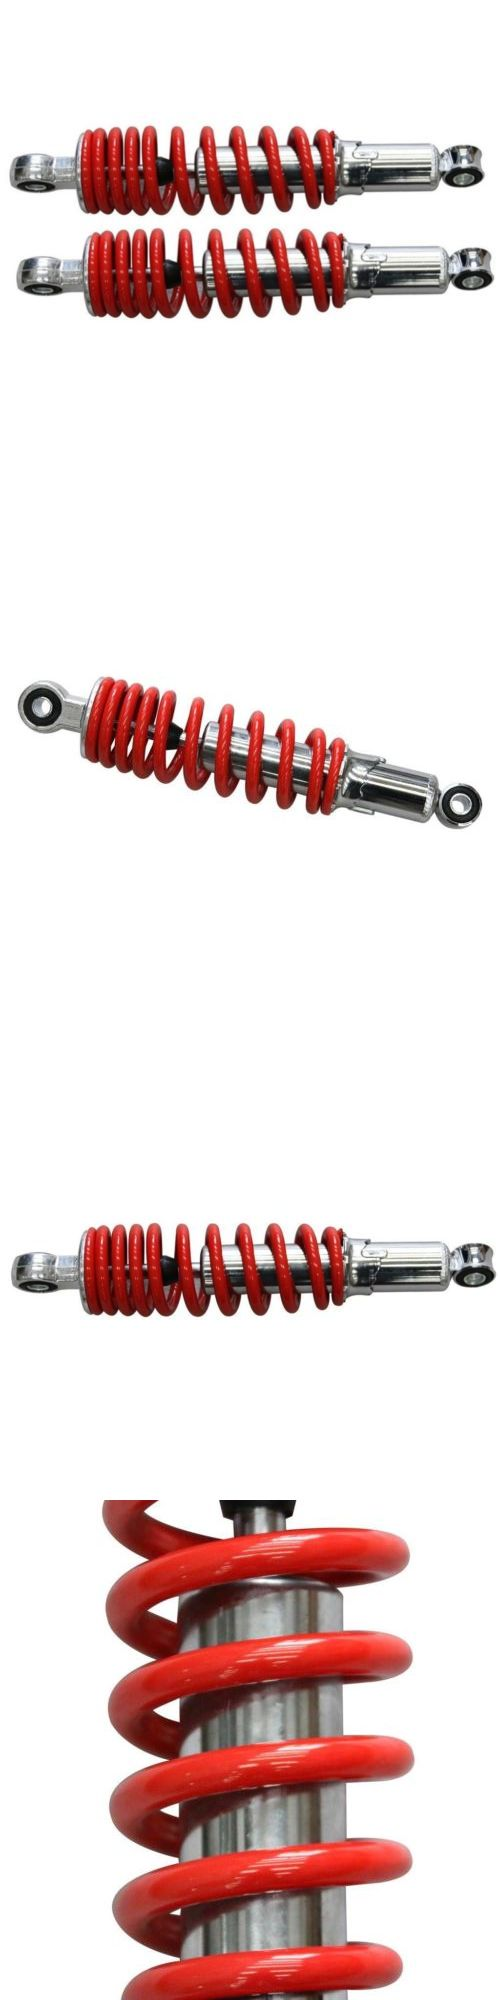 Parts and Accessories 64657: 2X 290Mm 11 Rear Shock 50Cc 70 90 110Cc 125Cc Dirt Bike Atv Go Kart Baja Quads -> BUY IT NOW ONLY: $58.59 on eBay!